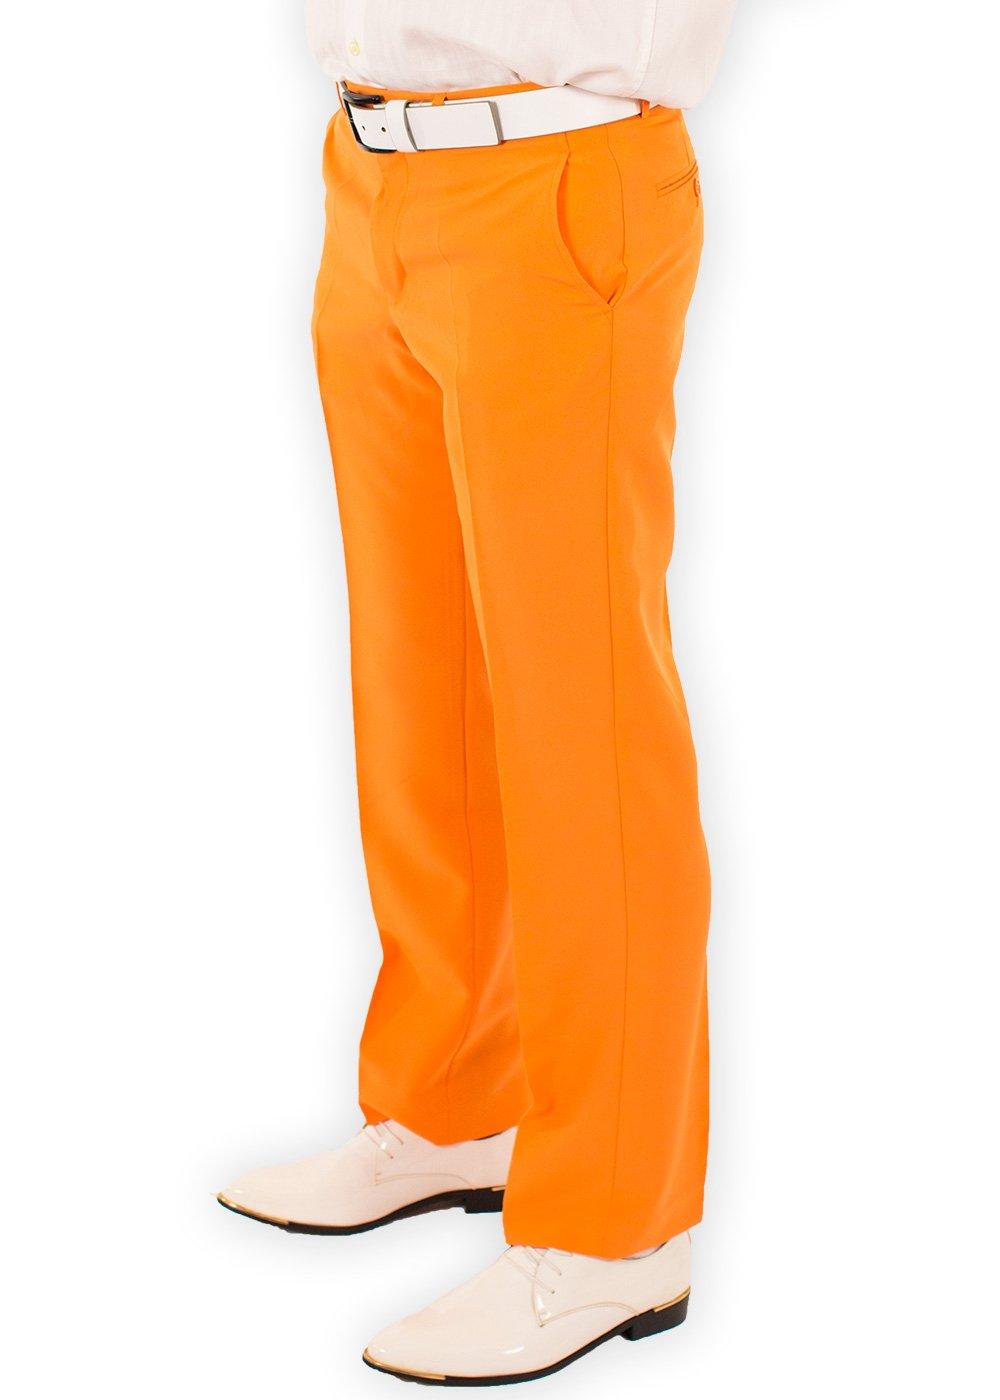 Festified Men's Classic Party Pants In Orange (44)